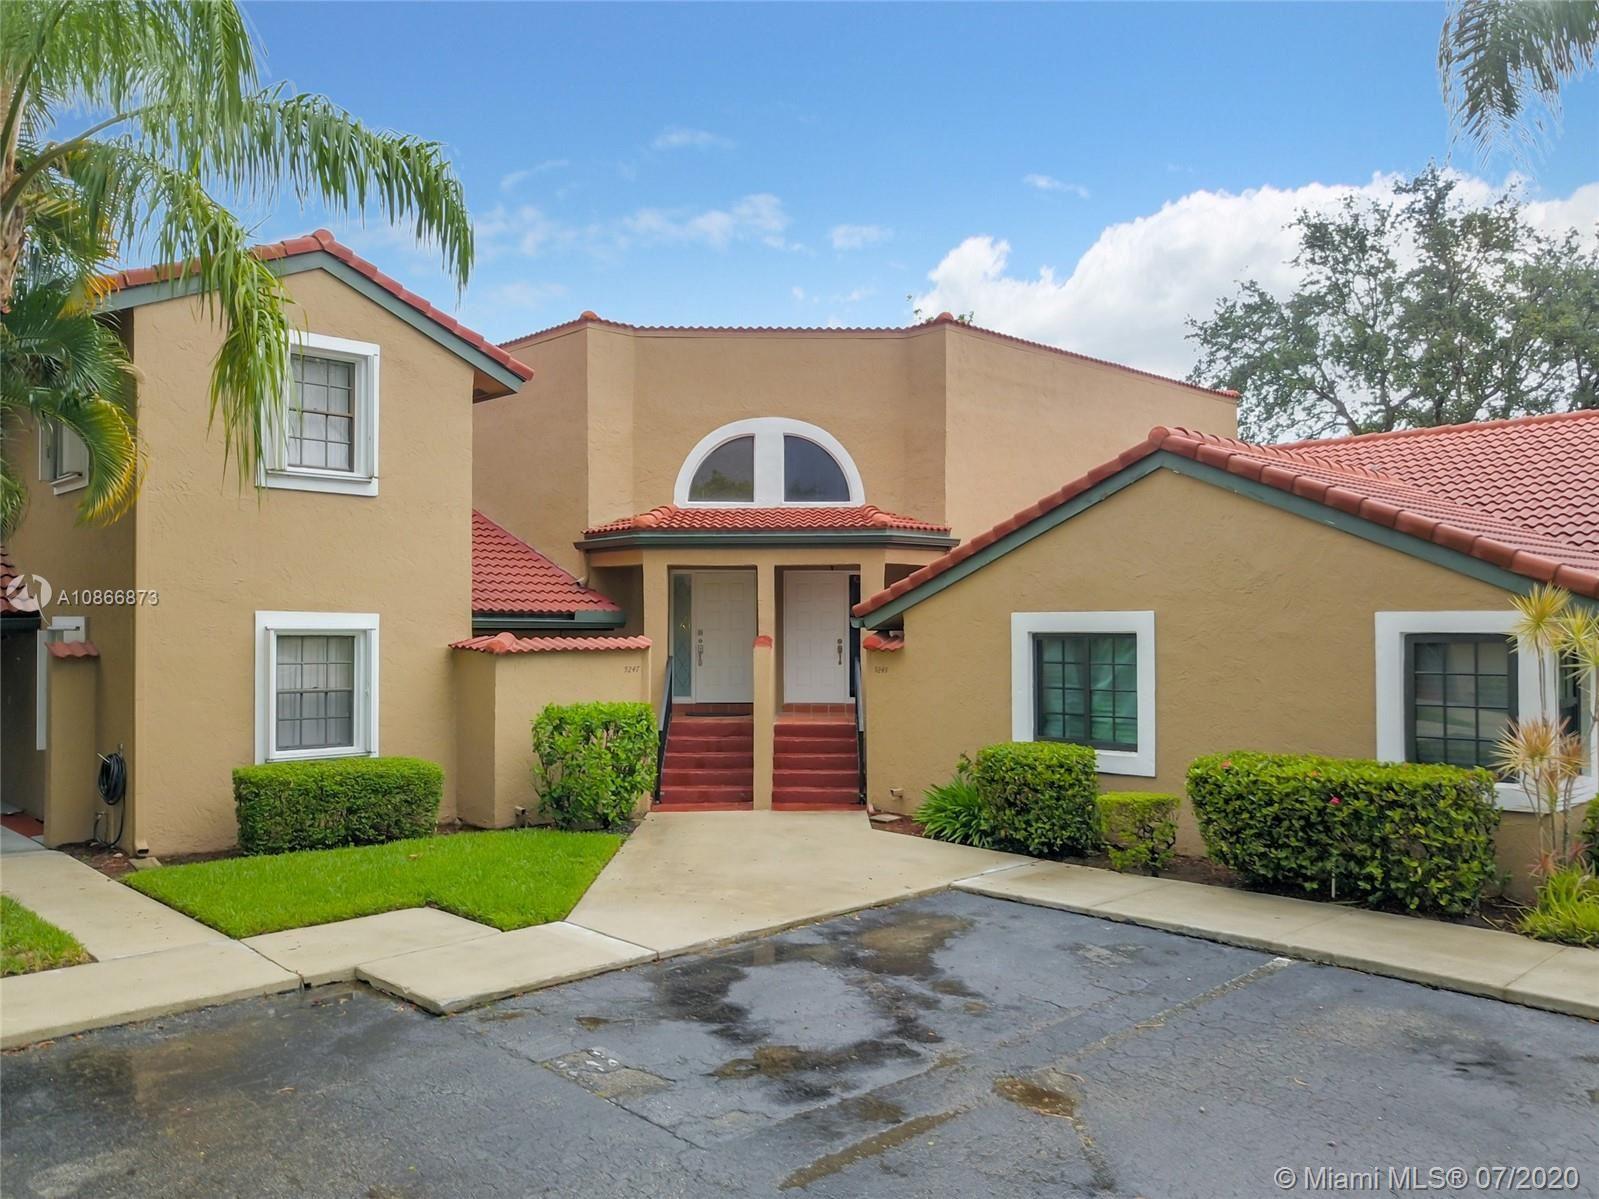 Photo of 9247 W Sunrise Blvd, Plantation, FL 33322 (MLS # A10866873)